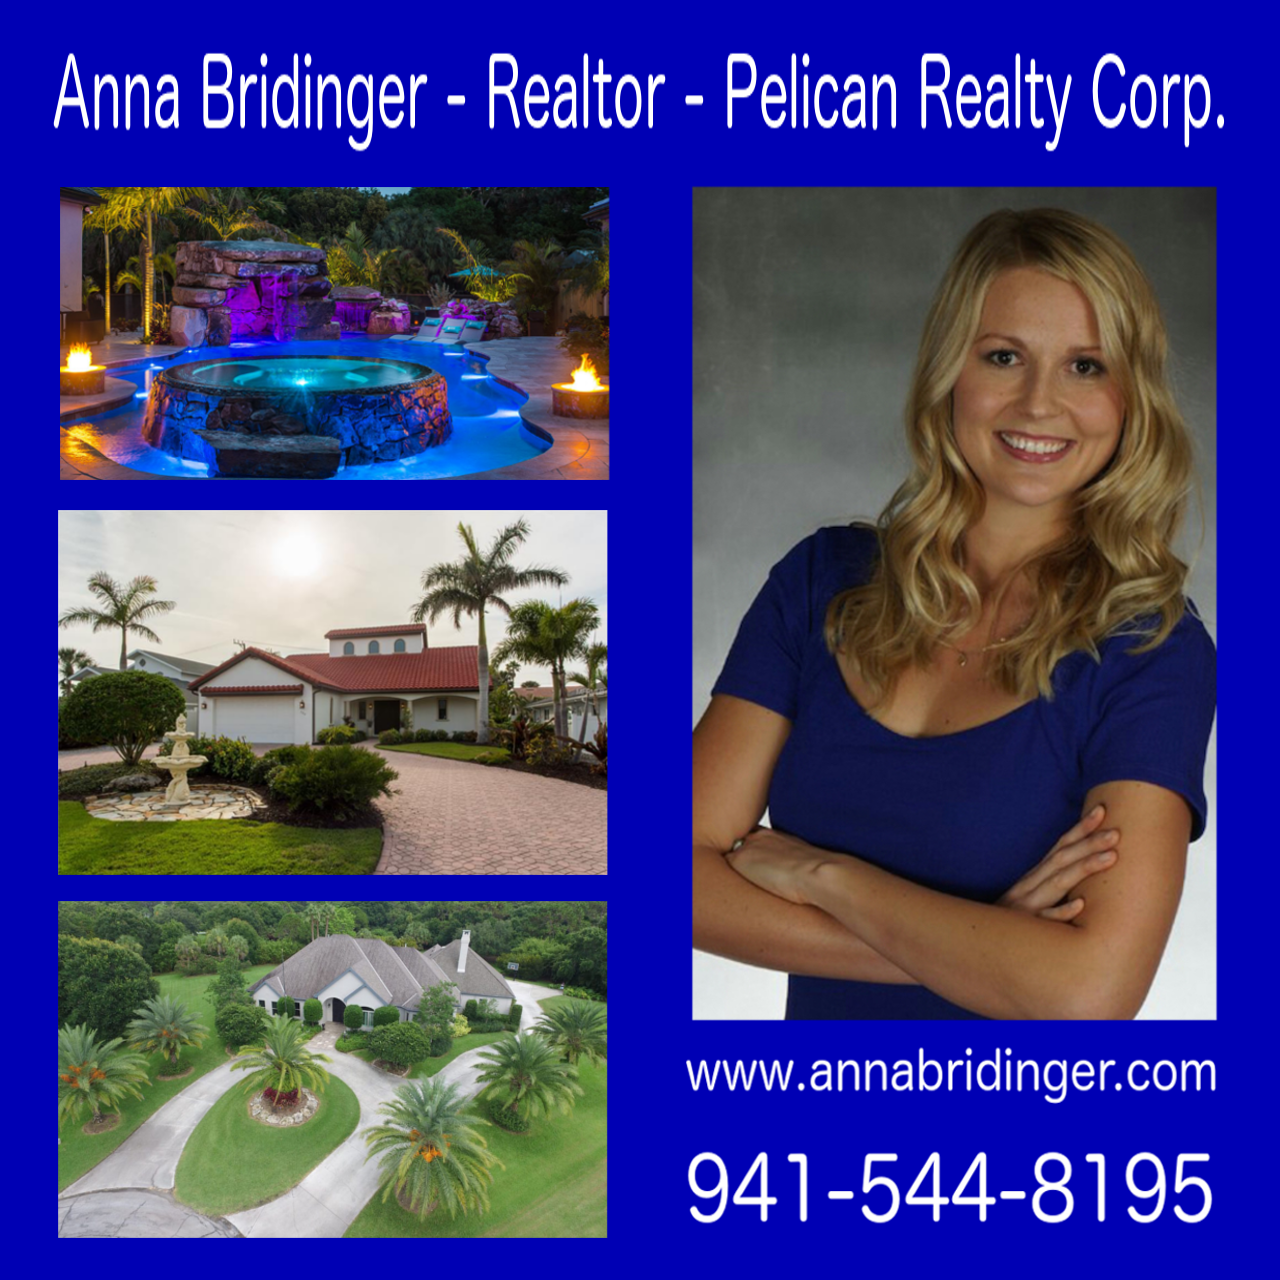 http://www.polishfloridabiz.com/002-anna-bridinger-realtor-at-pelican-realty-corp/